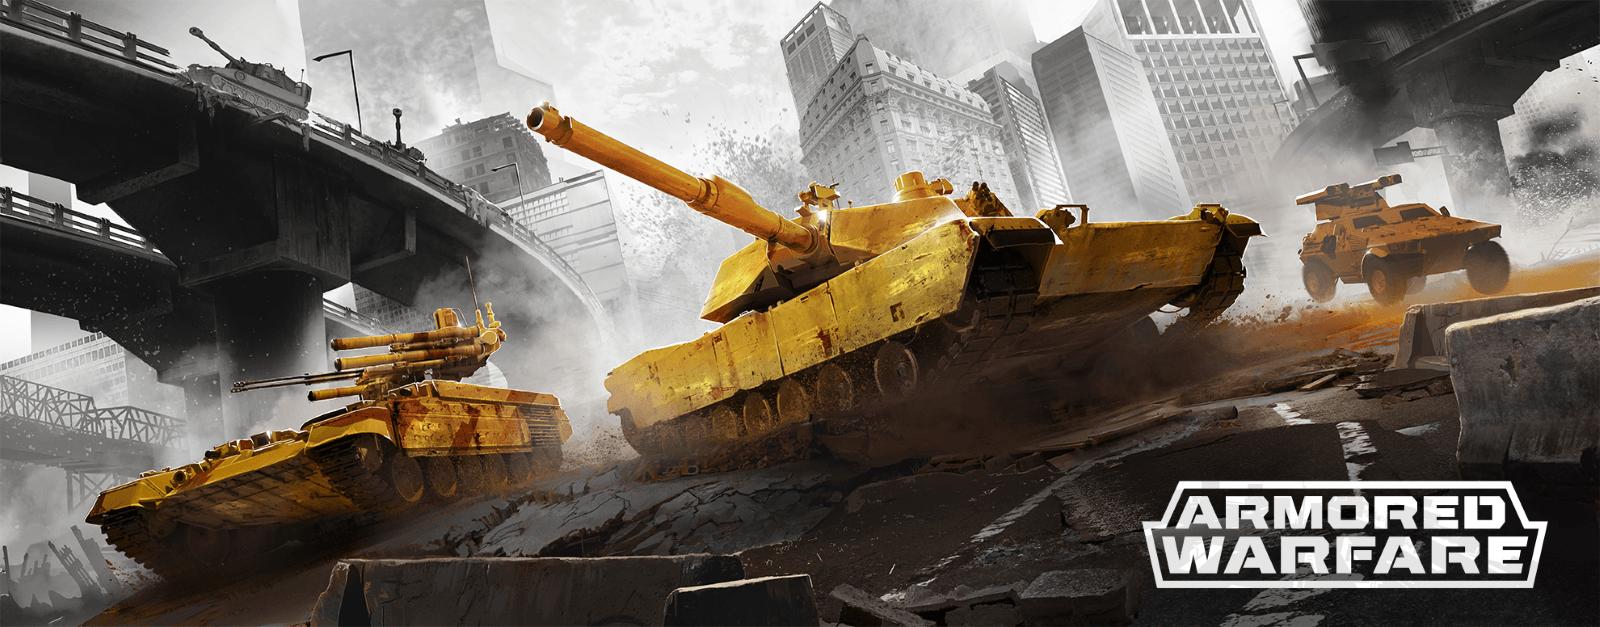 Armored Warfare now in Worldwide Open Beta news header